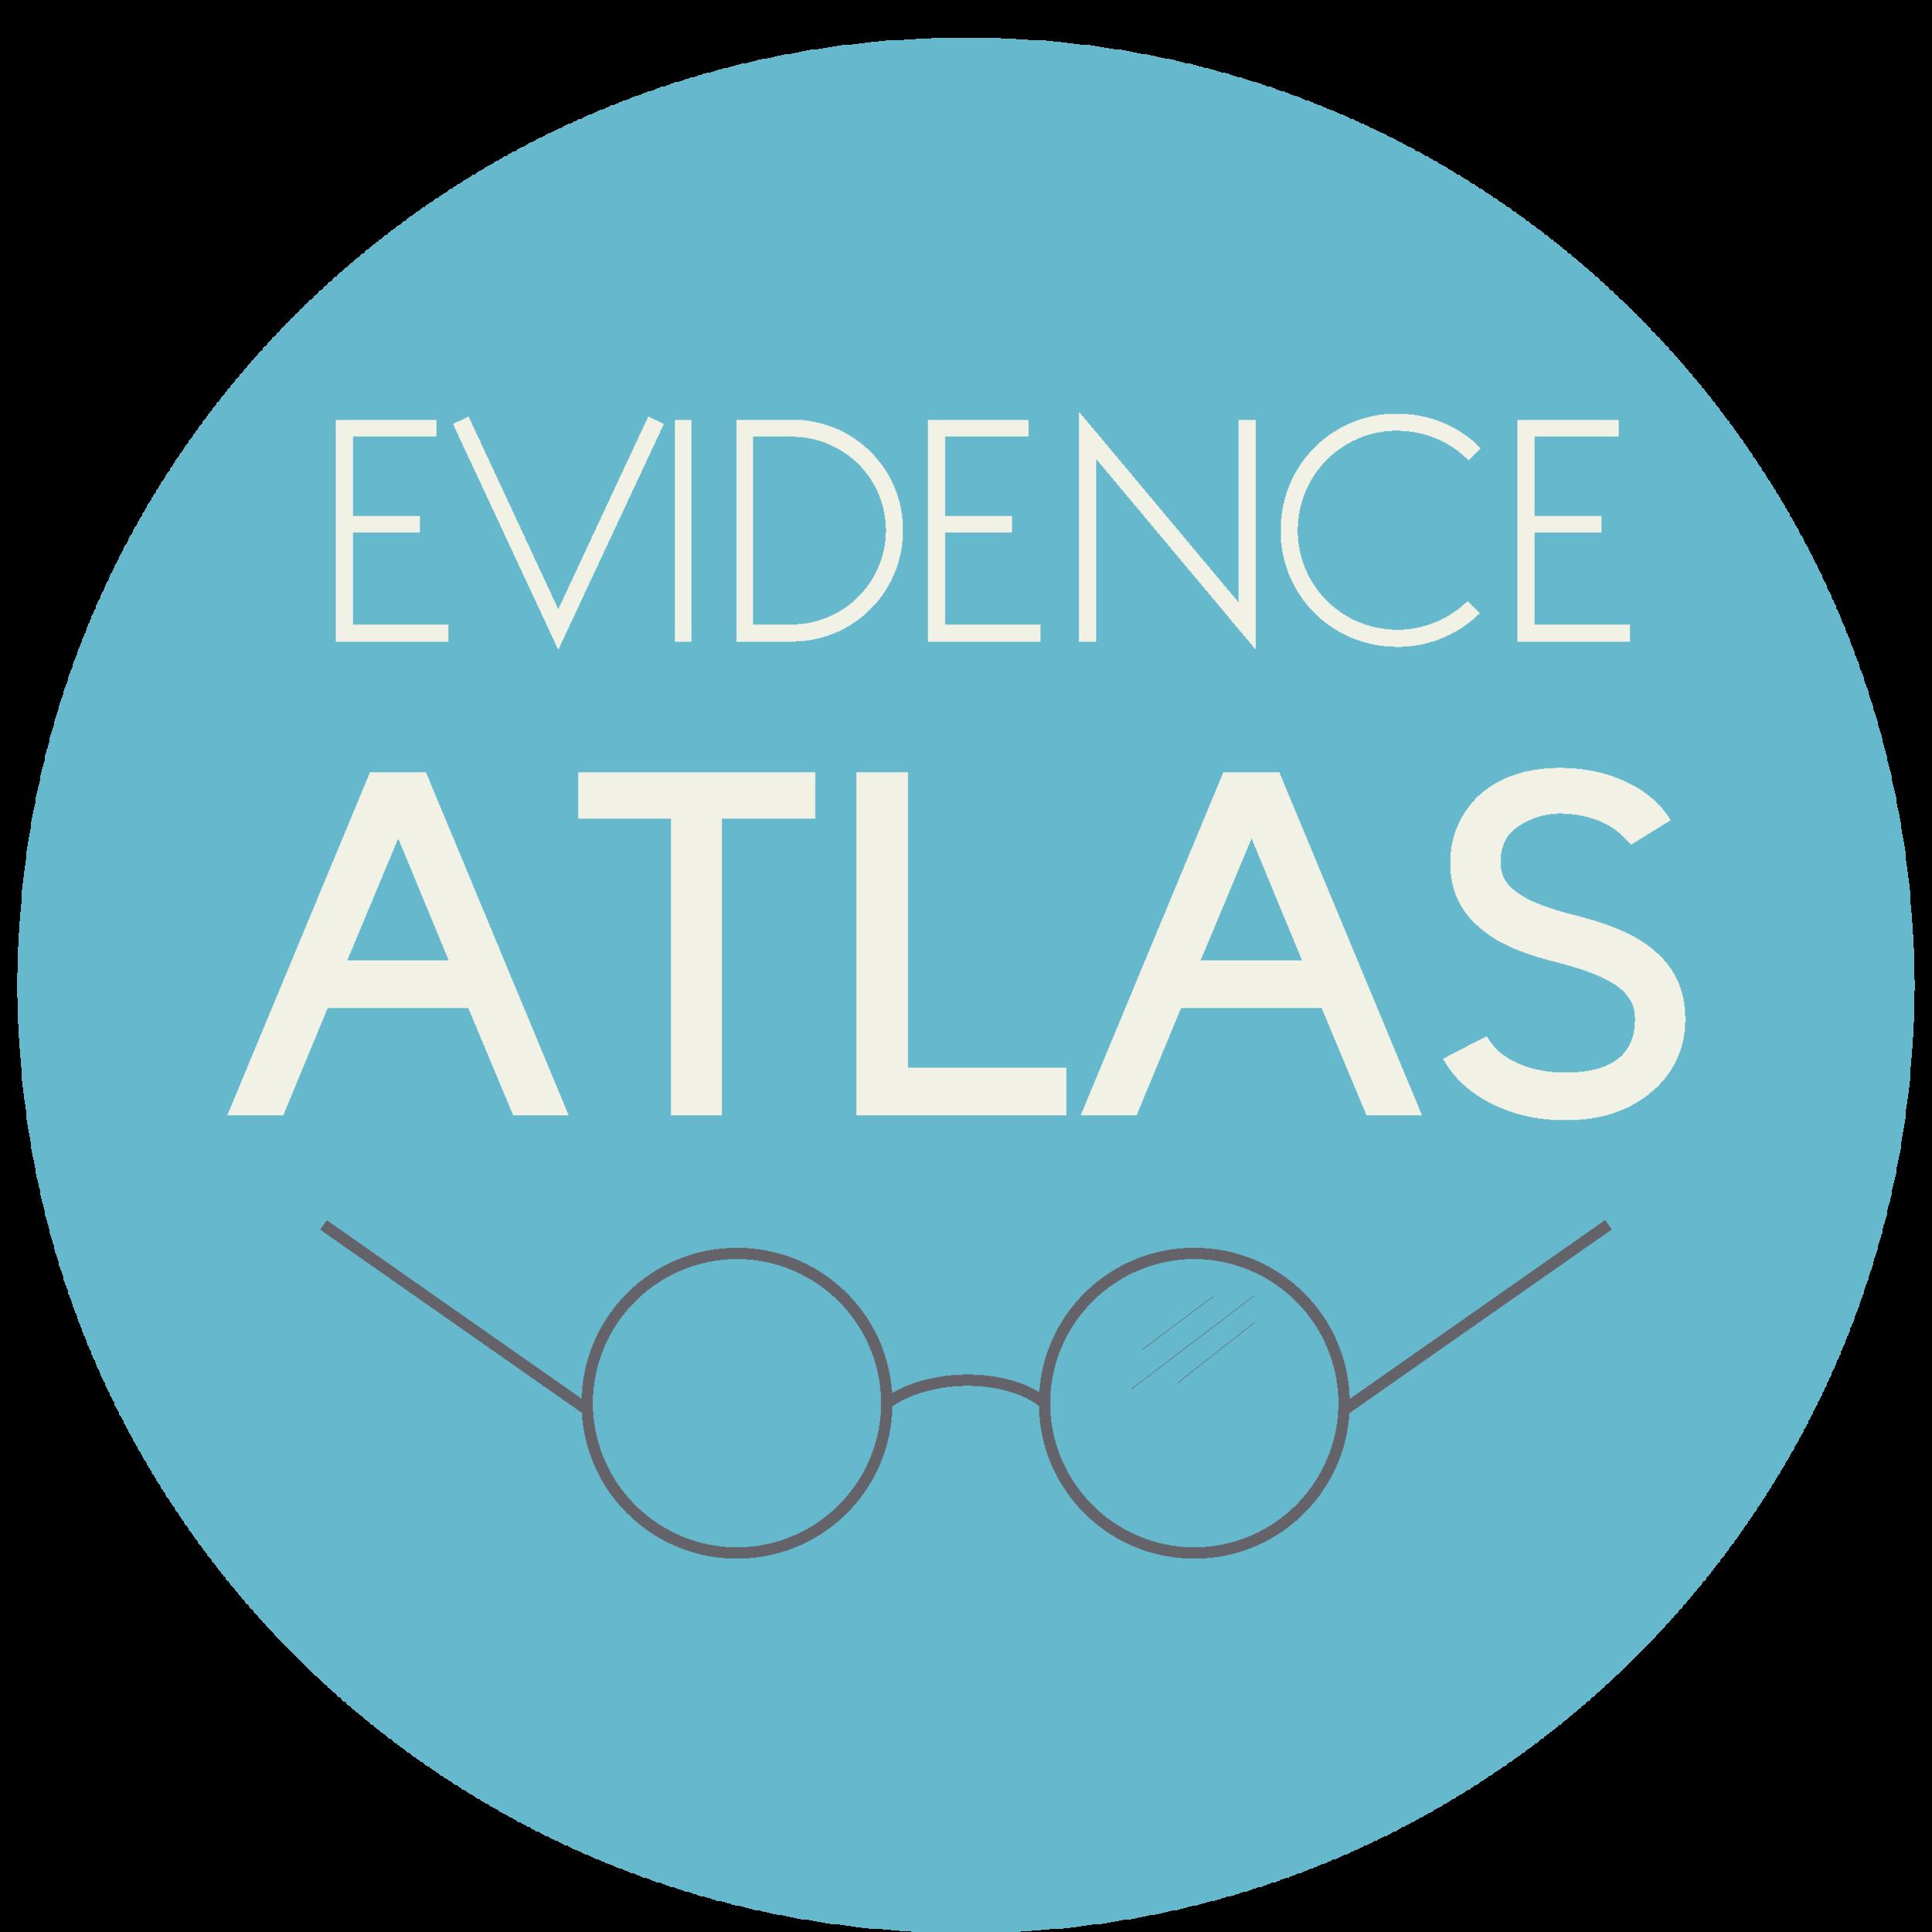 The POCUS ATLAS-25.png